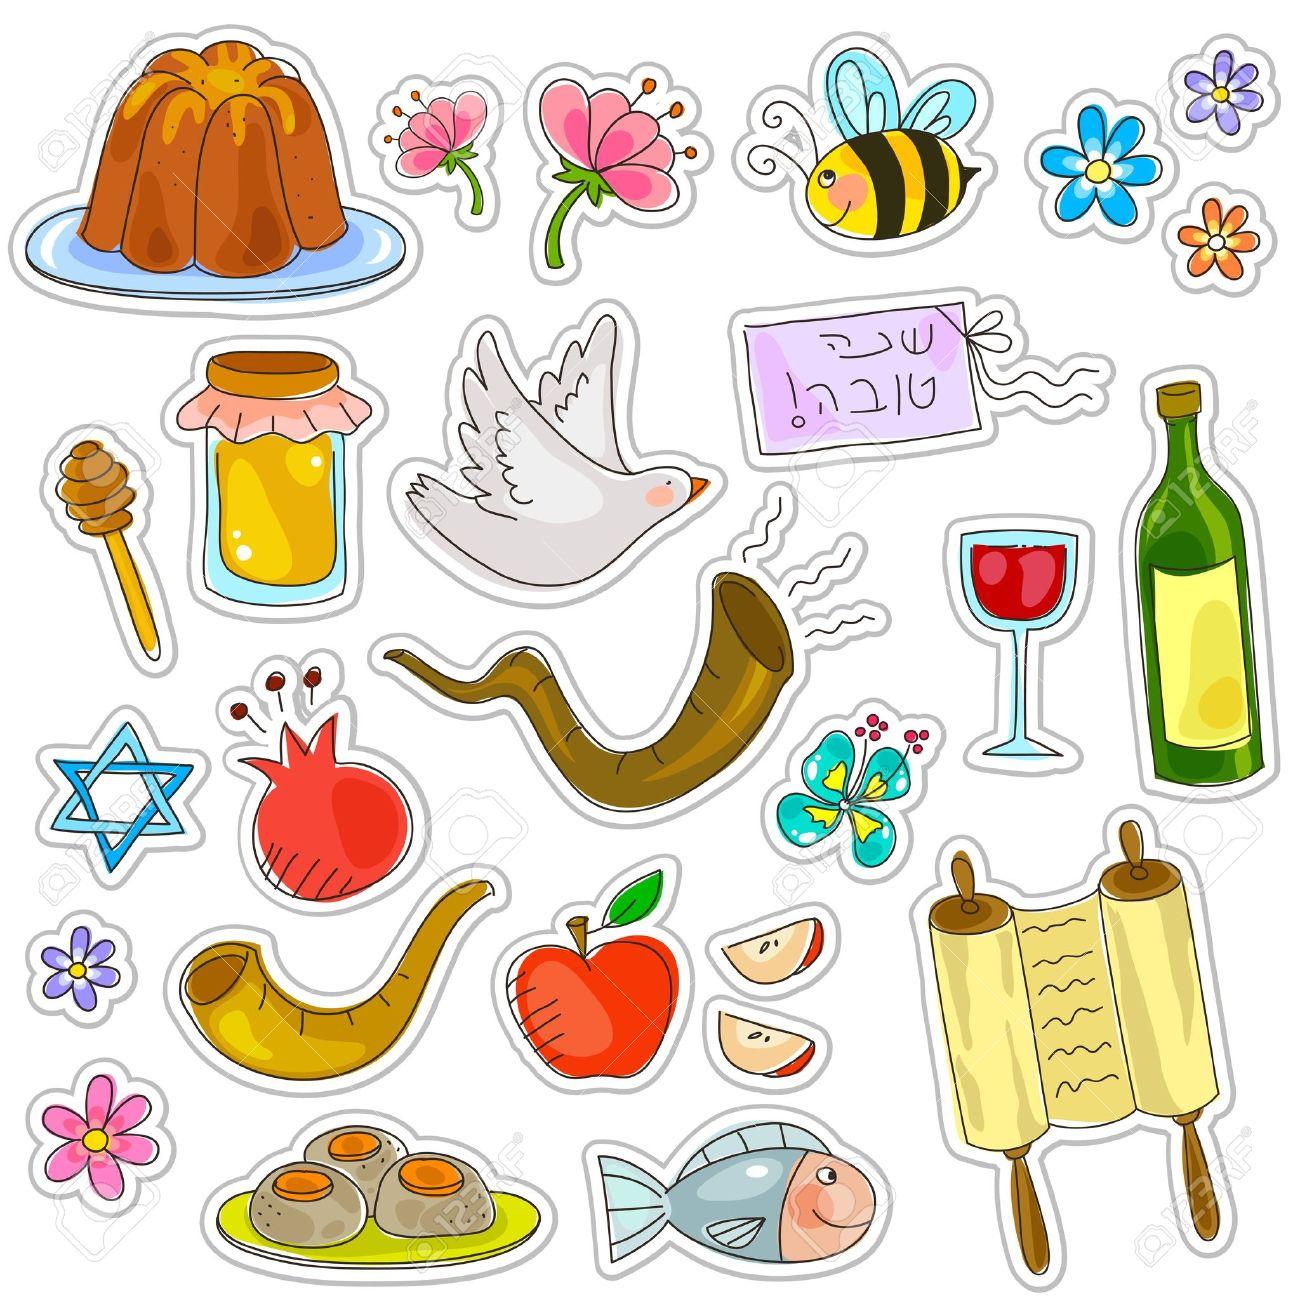 Symbols of rosh hashanah jewish new year royalty free cliparts symbols of rosh hashanah jewish new year stock vector 20744296 biocorpaavc